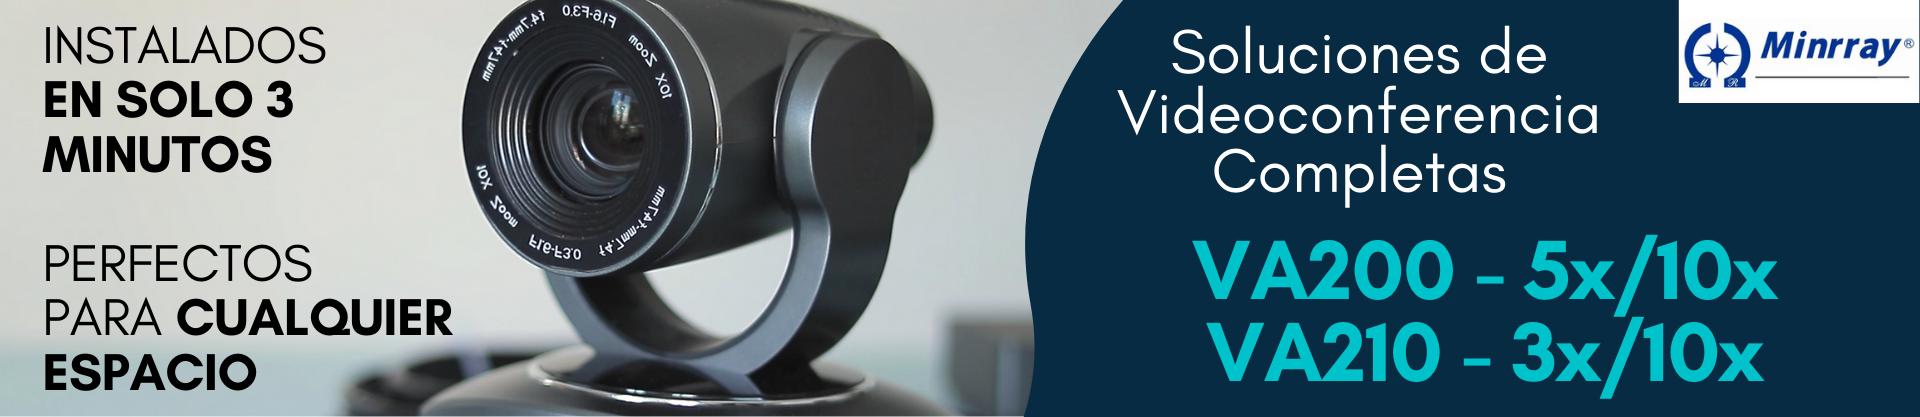 soluciones-videoconferencia-Minrray-VA200-VA210